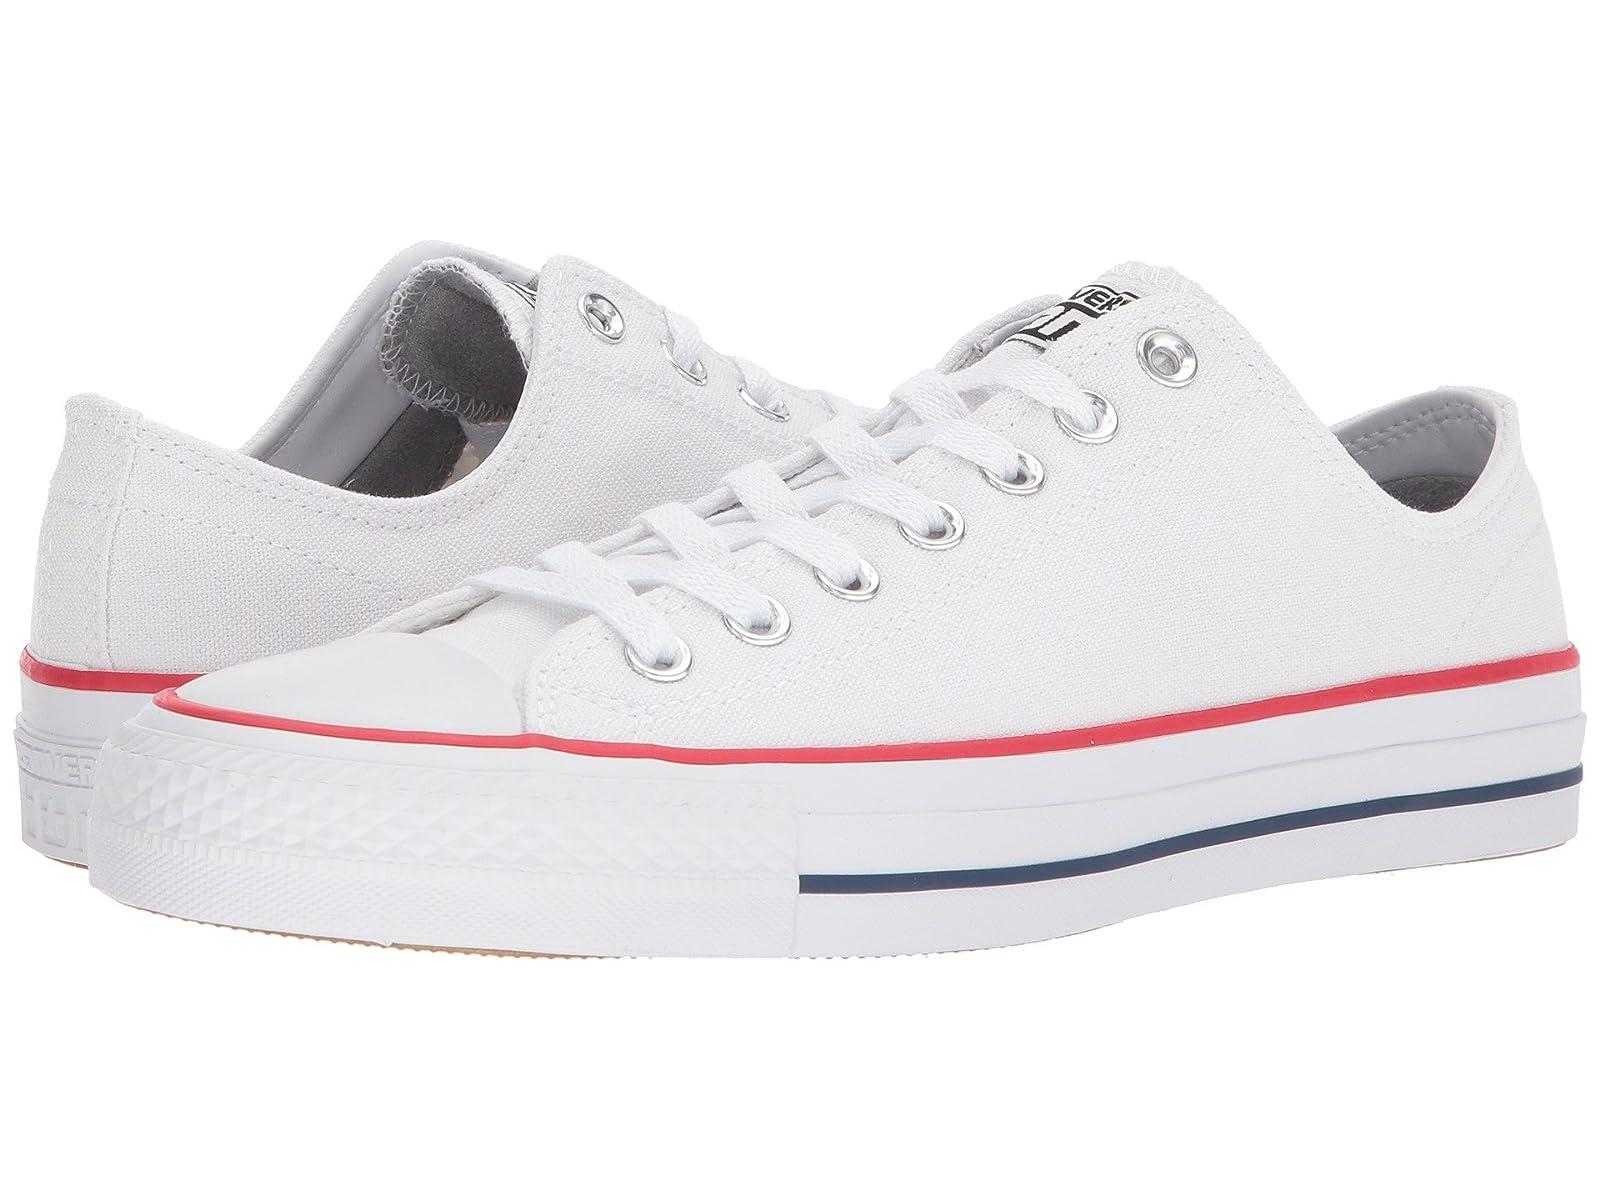 Converse Skate CTAS Pro Ox SkateAtmospheric grades have affordable shoes